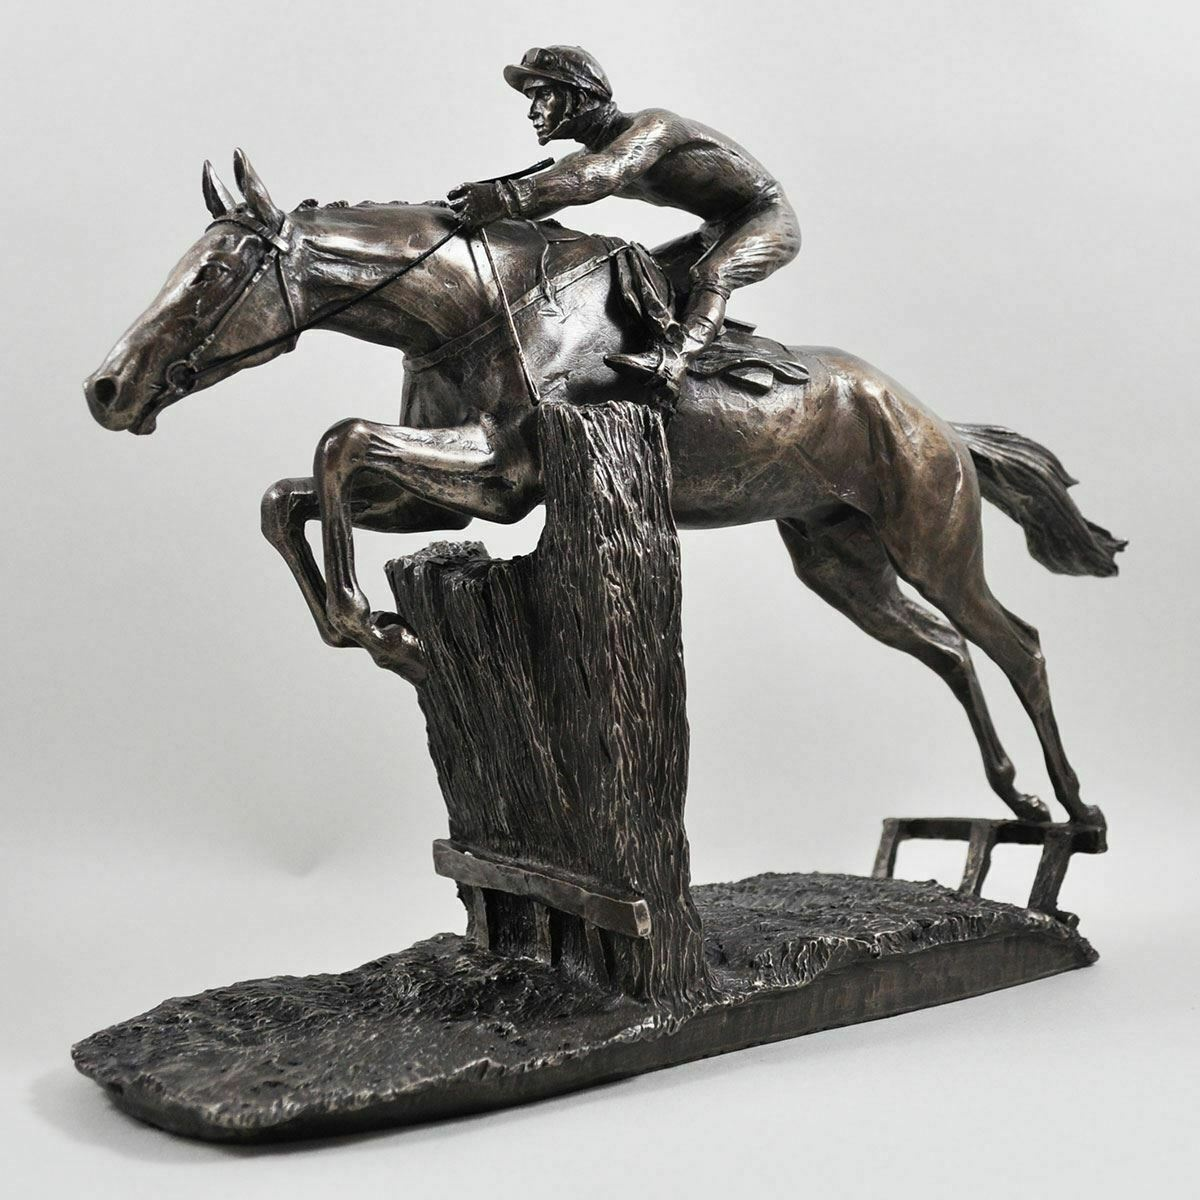 Bronze Race Horse Sculpture Horses Gifts Statue Figurine Figurine Figurine Ornament Figure dd5ba9